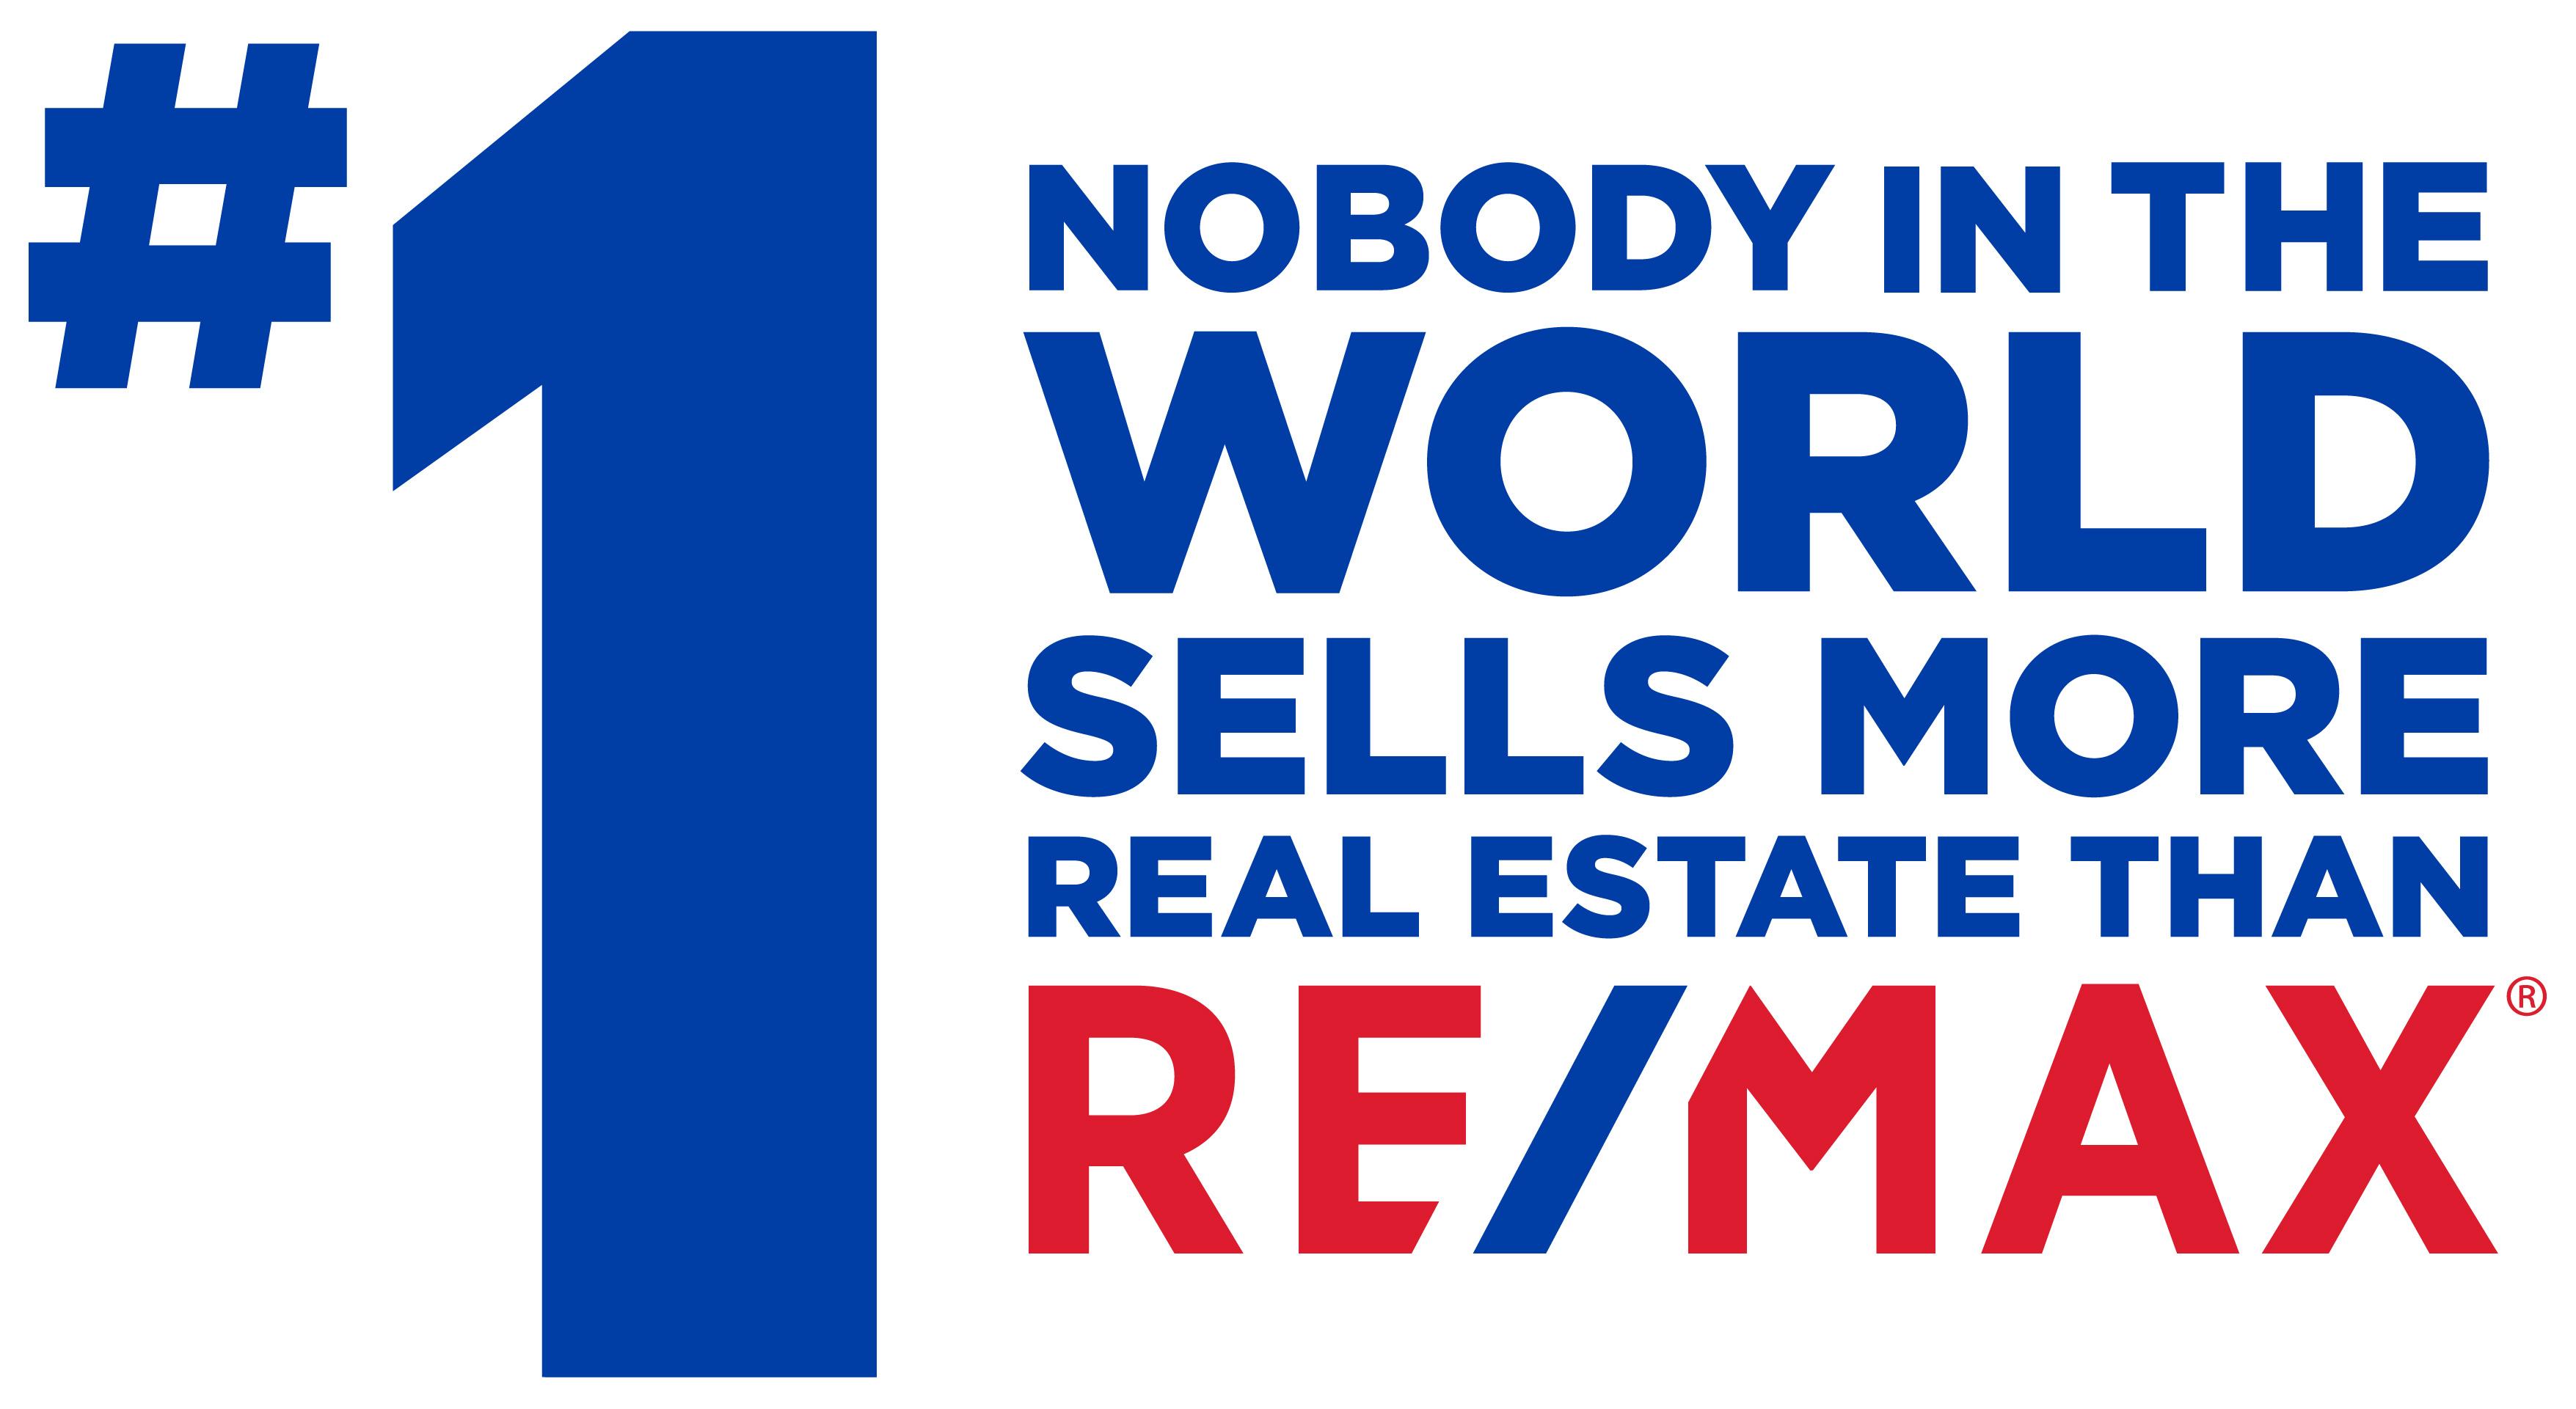 Grant Team Properties RE/MAX Elite Short Sale Consequences